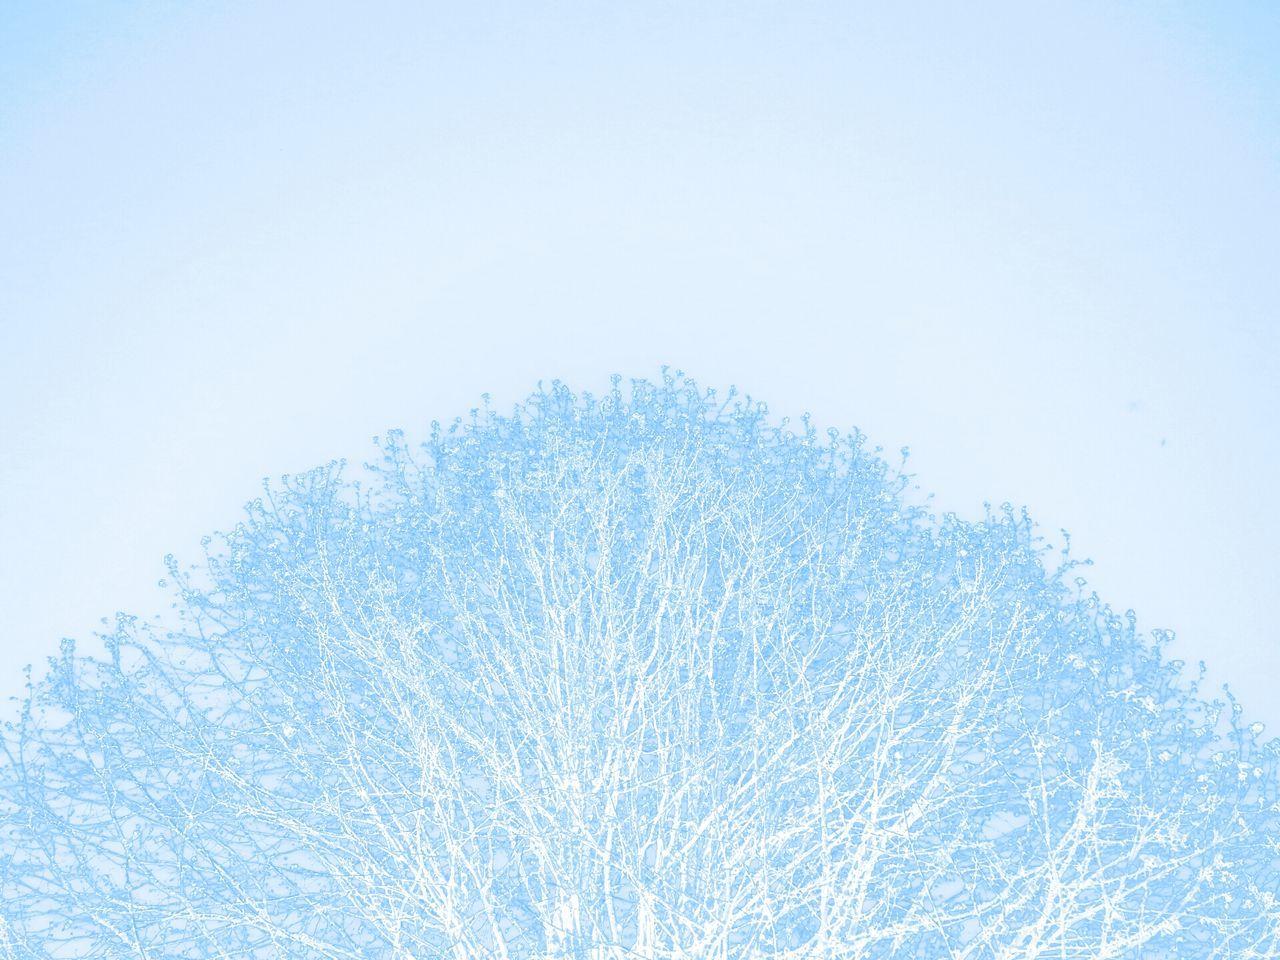 Sky Fluo  Colors Nature Beautiful Artistic Photo Artphotography Art Photography Artistic Photography Artsy Tree